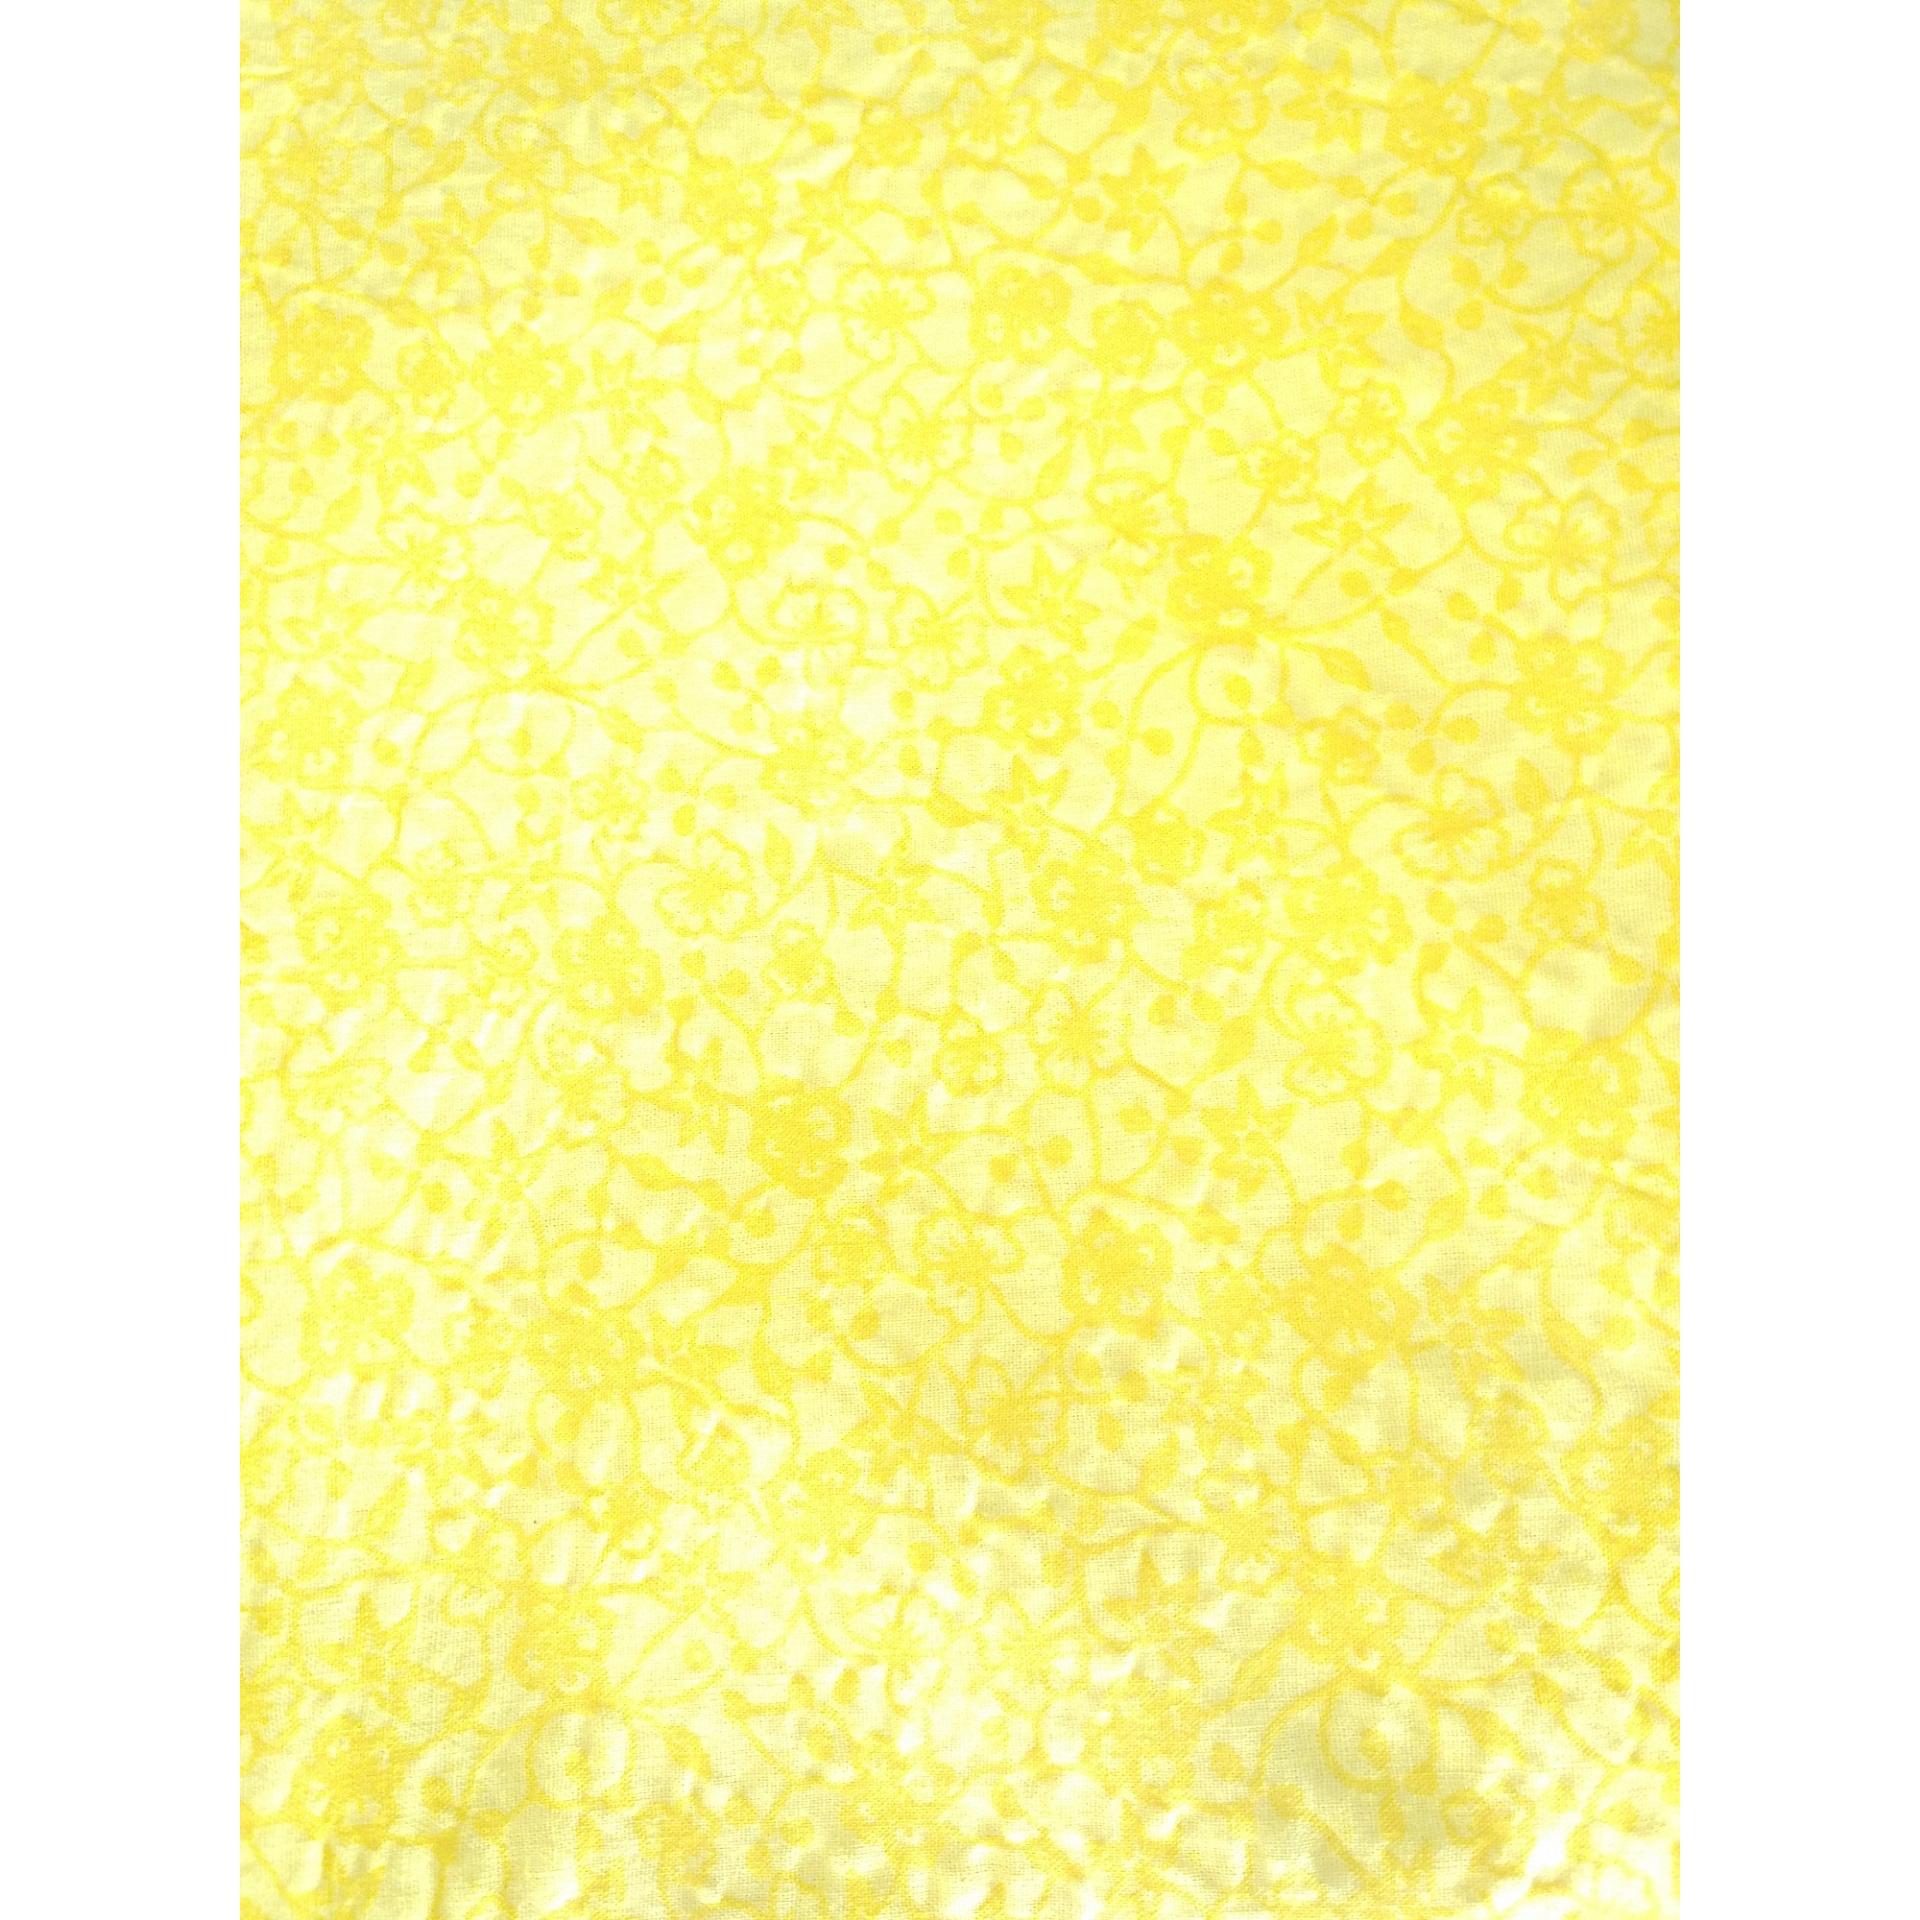 Kain Batik Motif Emboss Daftar Harga Terkini Terlengkap Di Toko Produk Ukm Bumn Parang Kembang Anjani Hitam Kuning